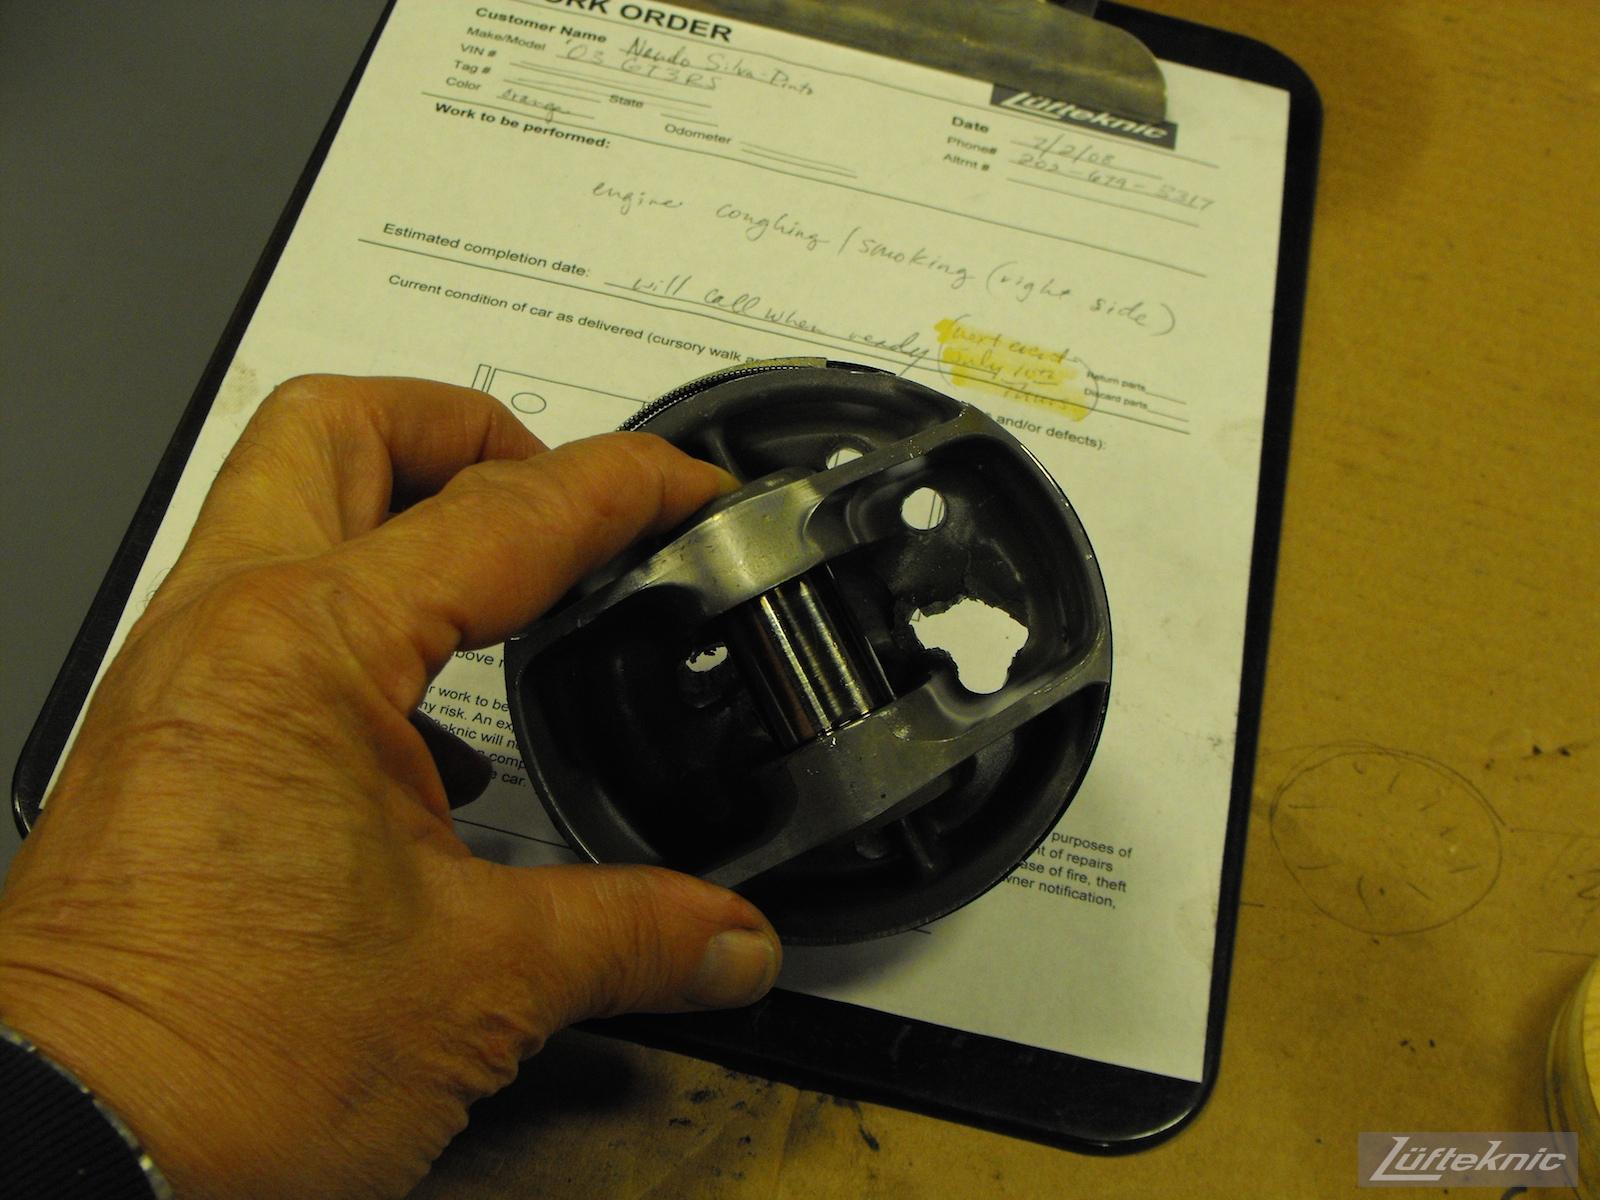 ZIP Racing Hazardous Sports Porsche 996 GT3 RS damaged piston